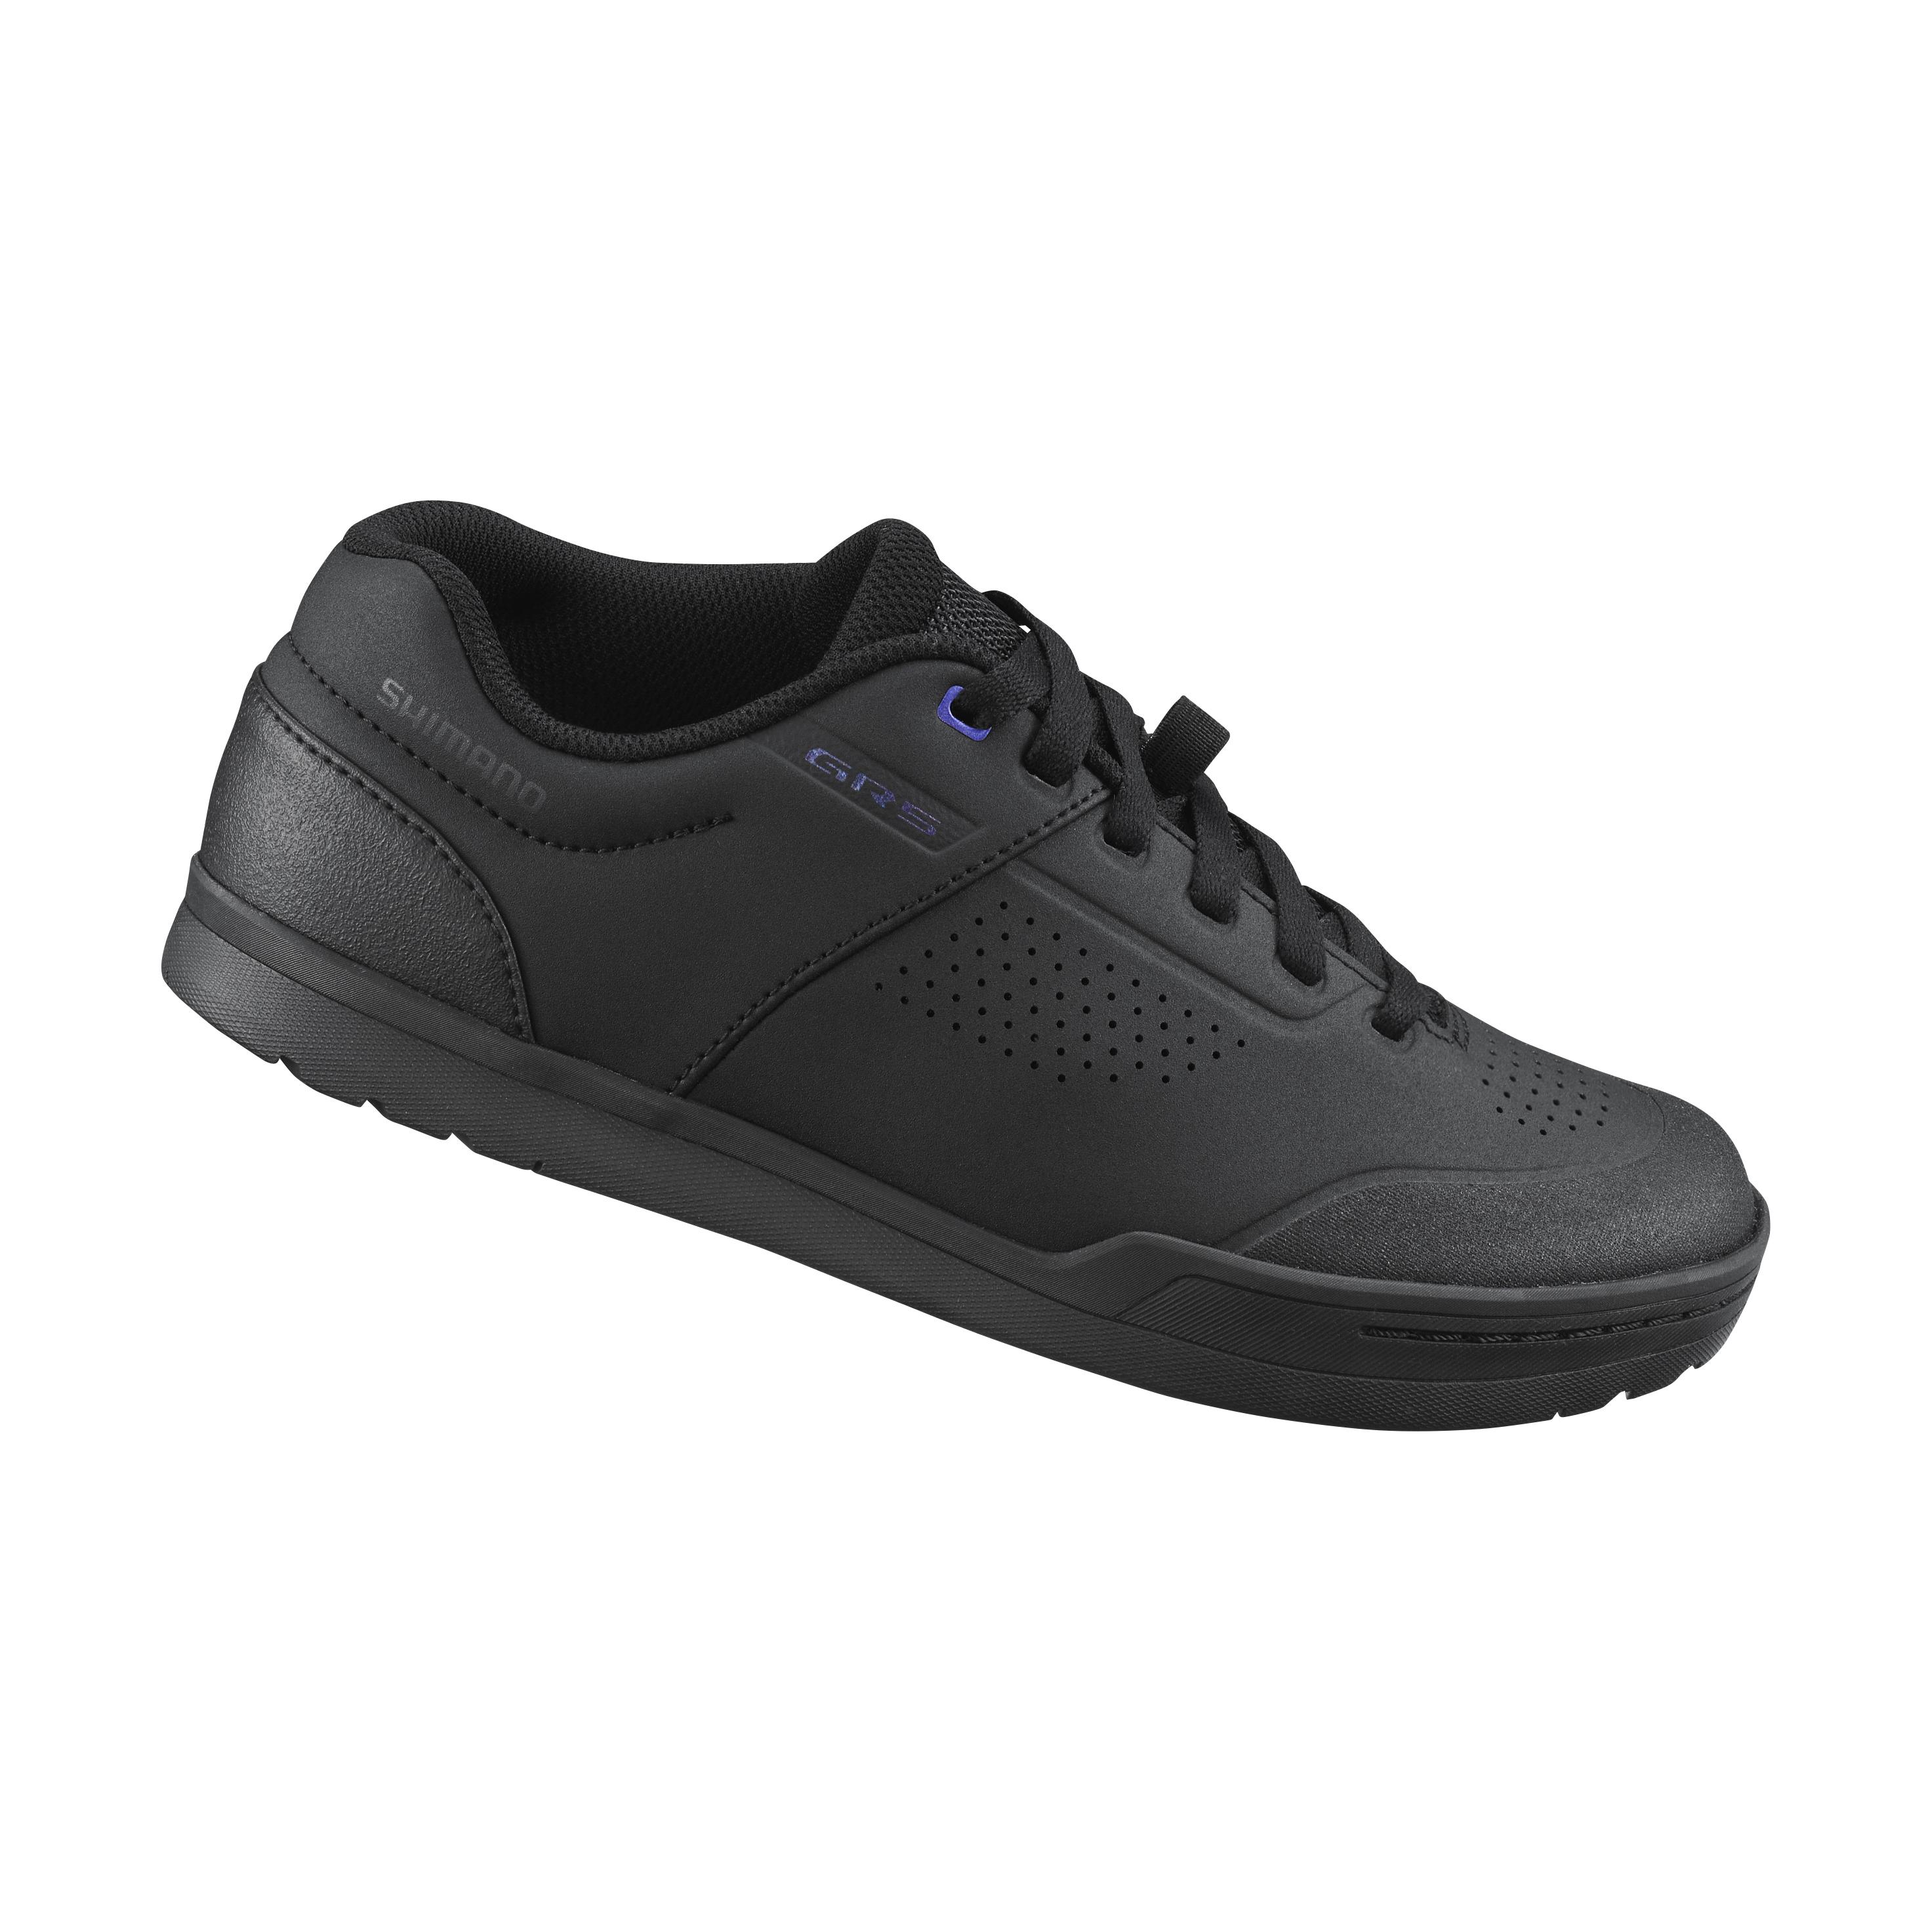 SHIMANO MTB obuv SH-GR501W, dámská, černá, 37